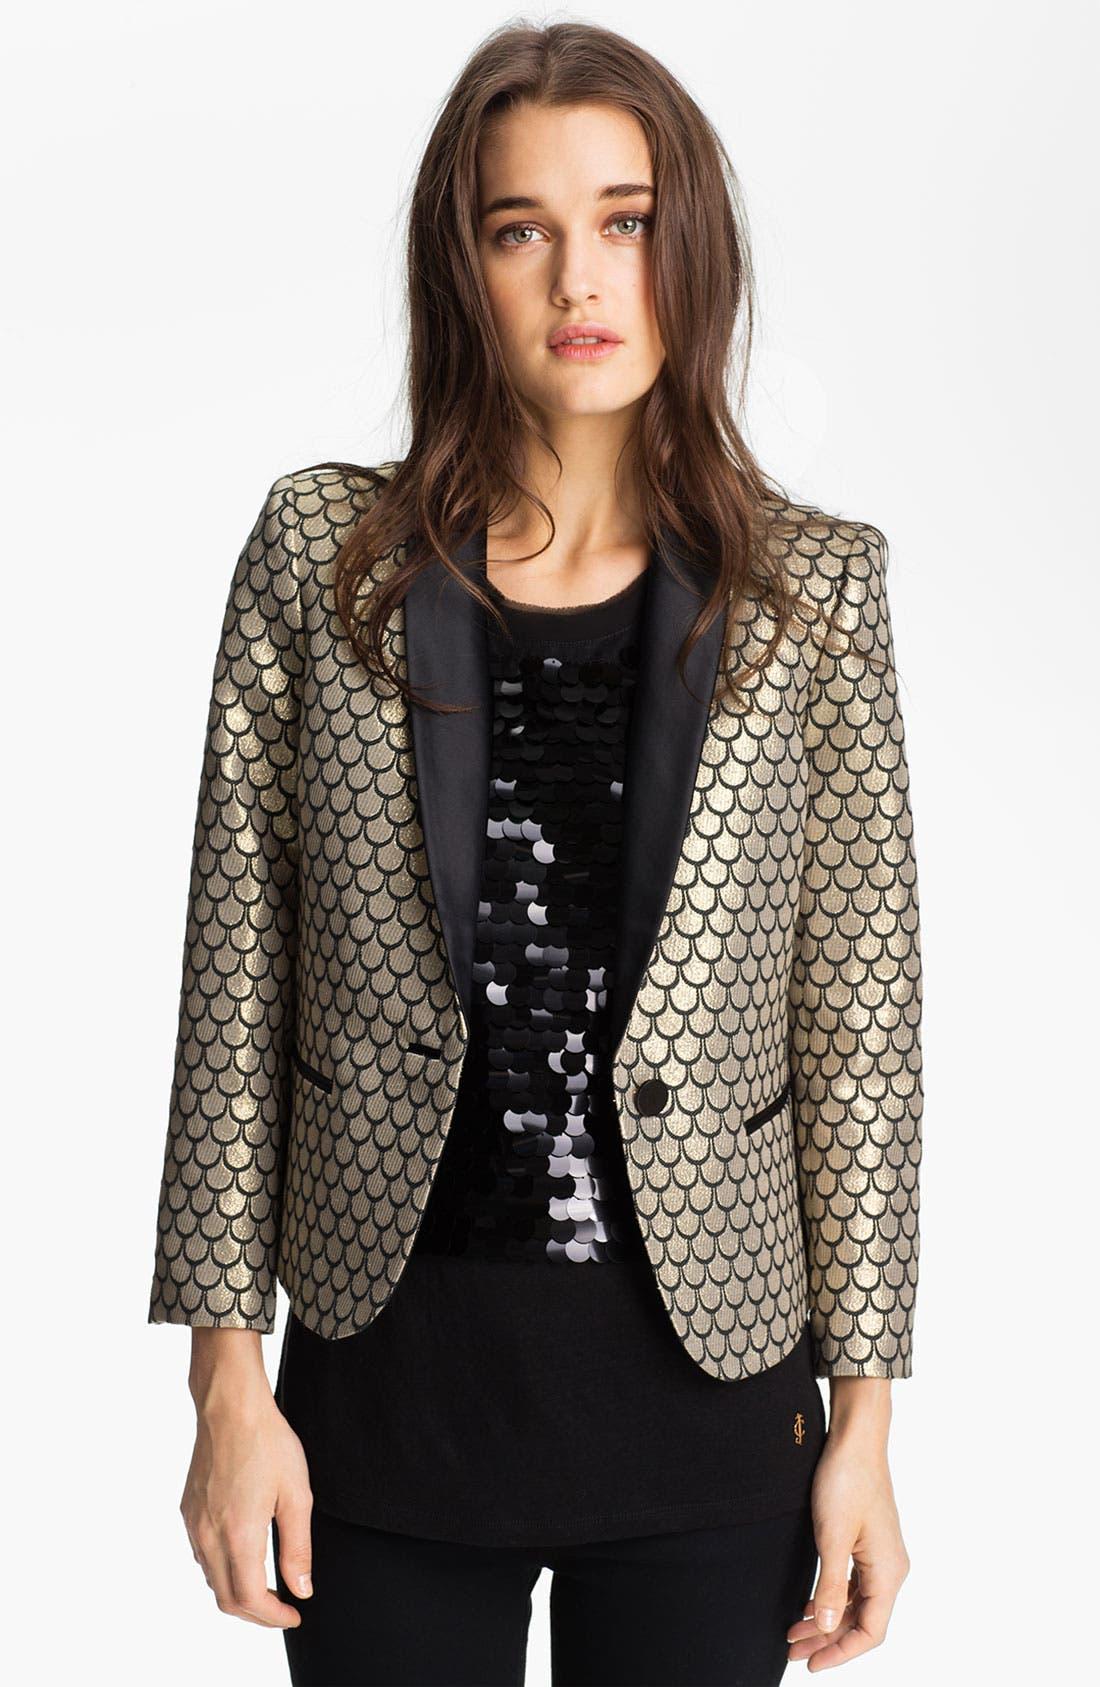 Alternate Image 1 Selected - Juicy Couture Metallic Fishscale Jacquard Jacket